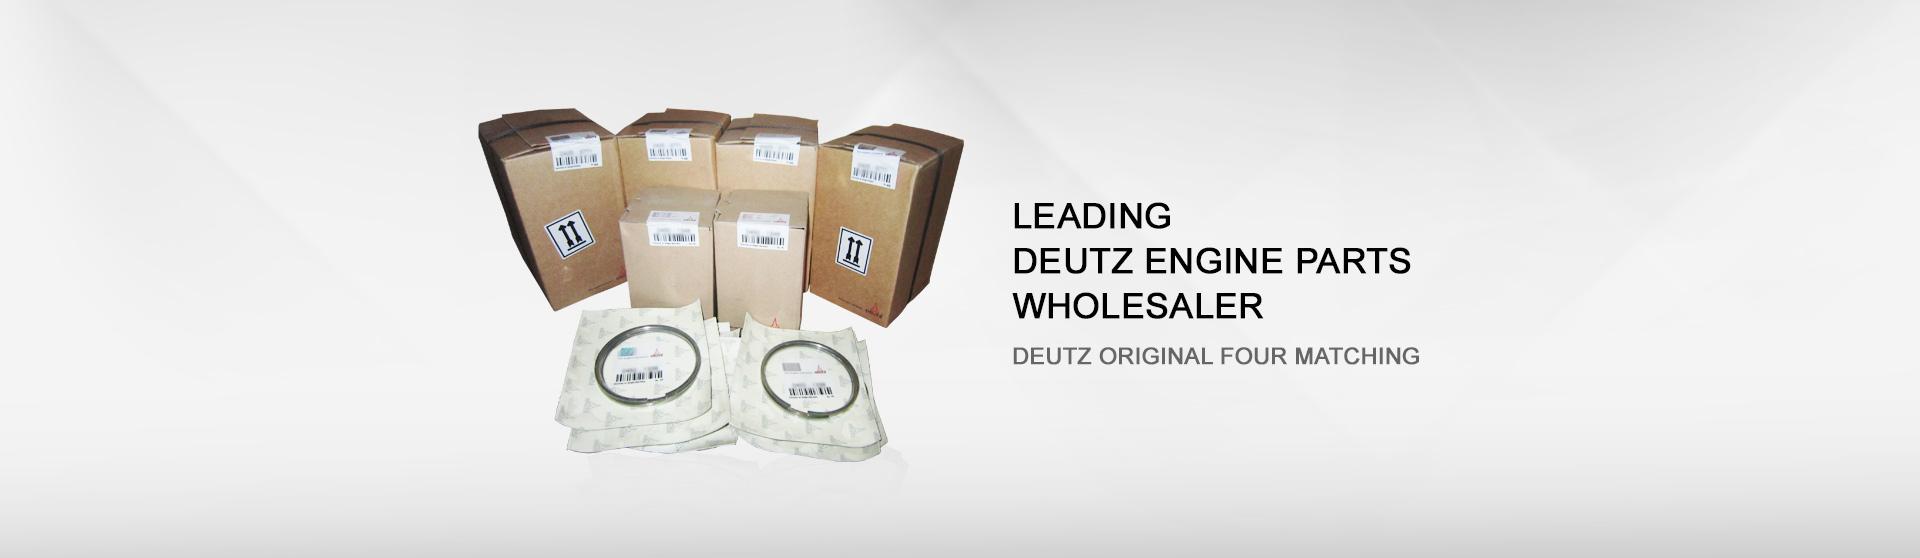 DEUTZ original four matching